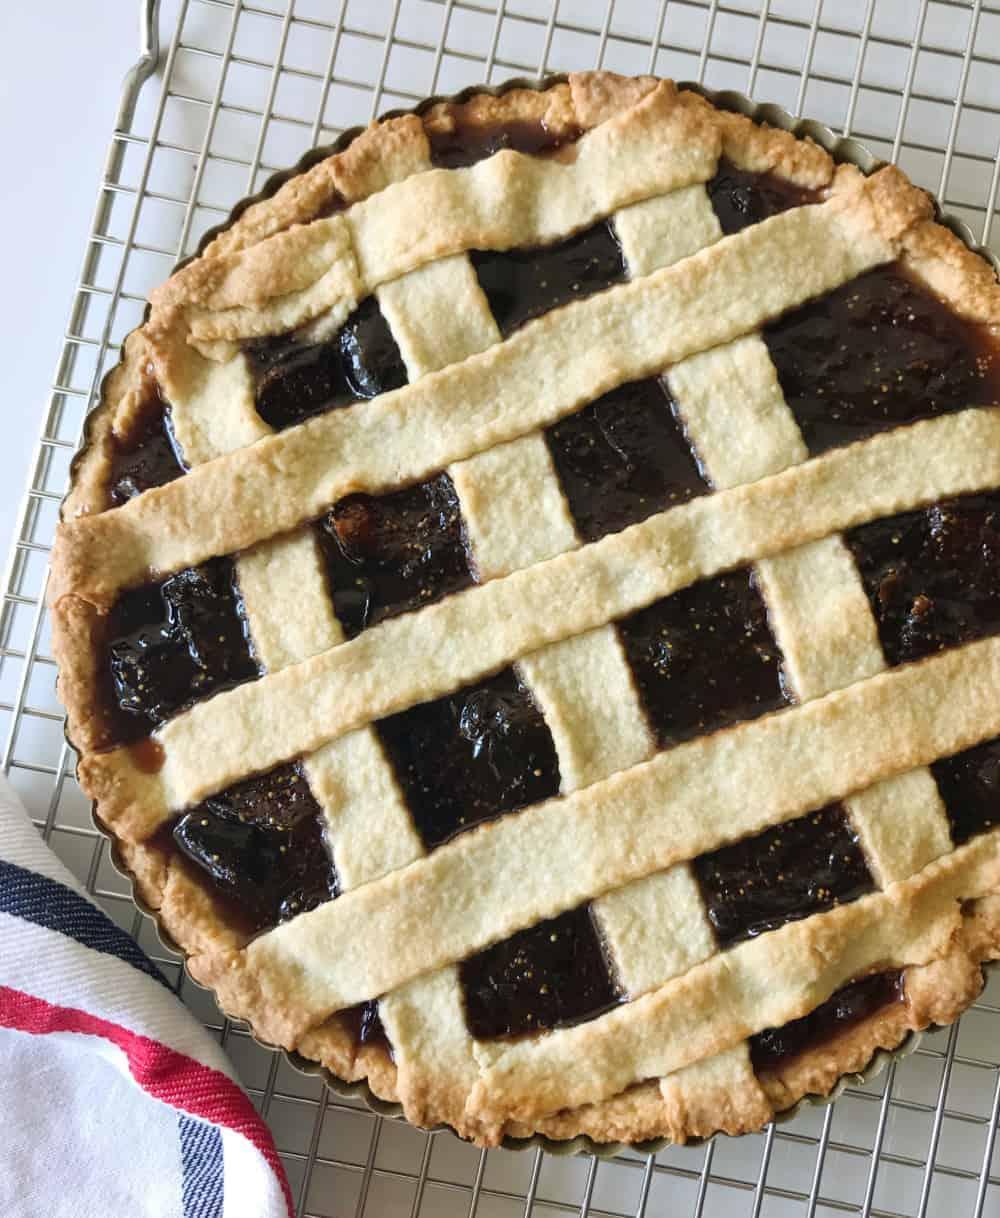 Whole fig lattice tart on wire rack, kitchen towel